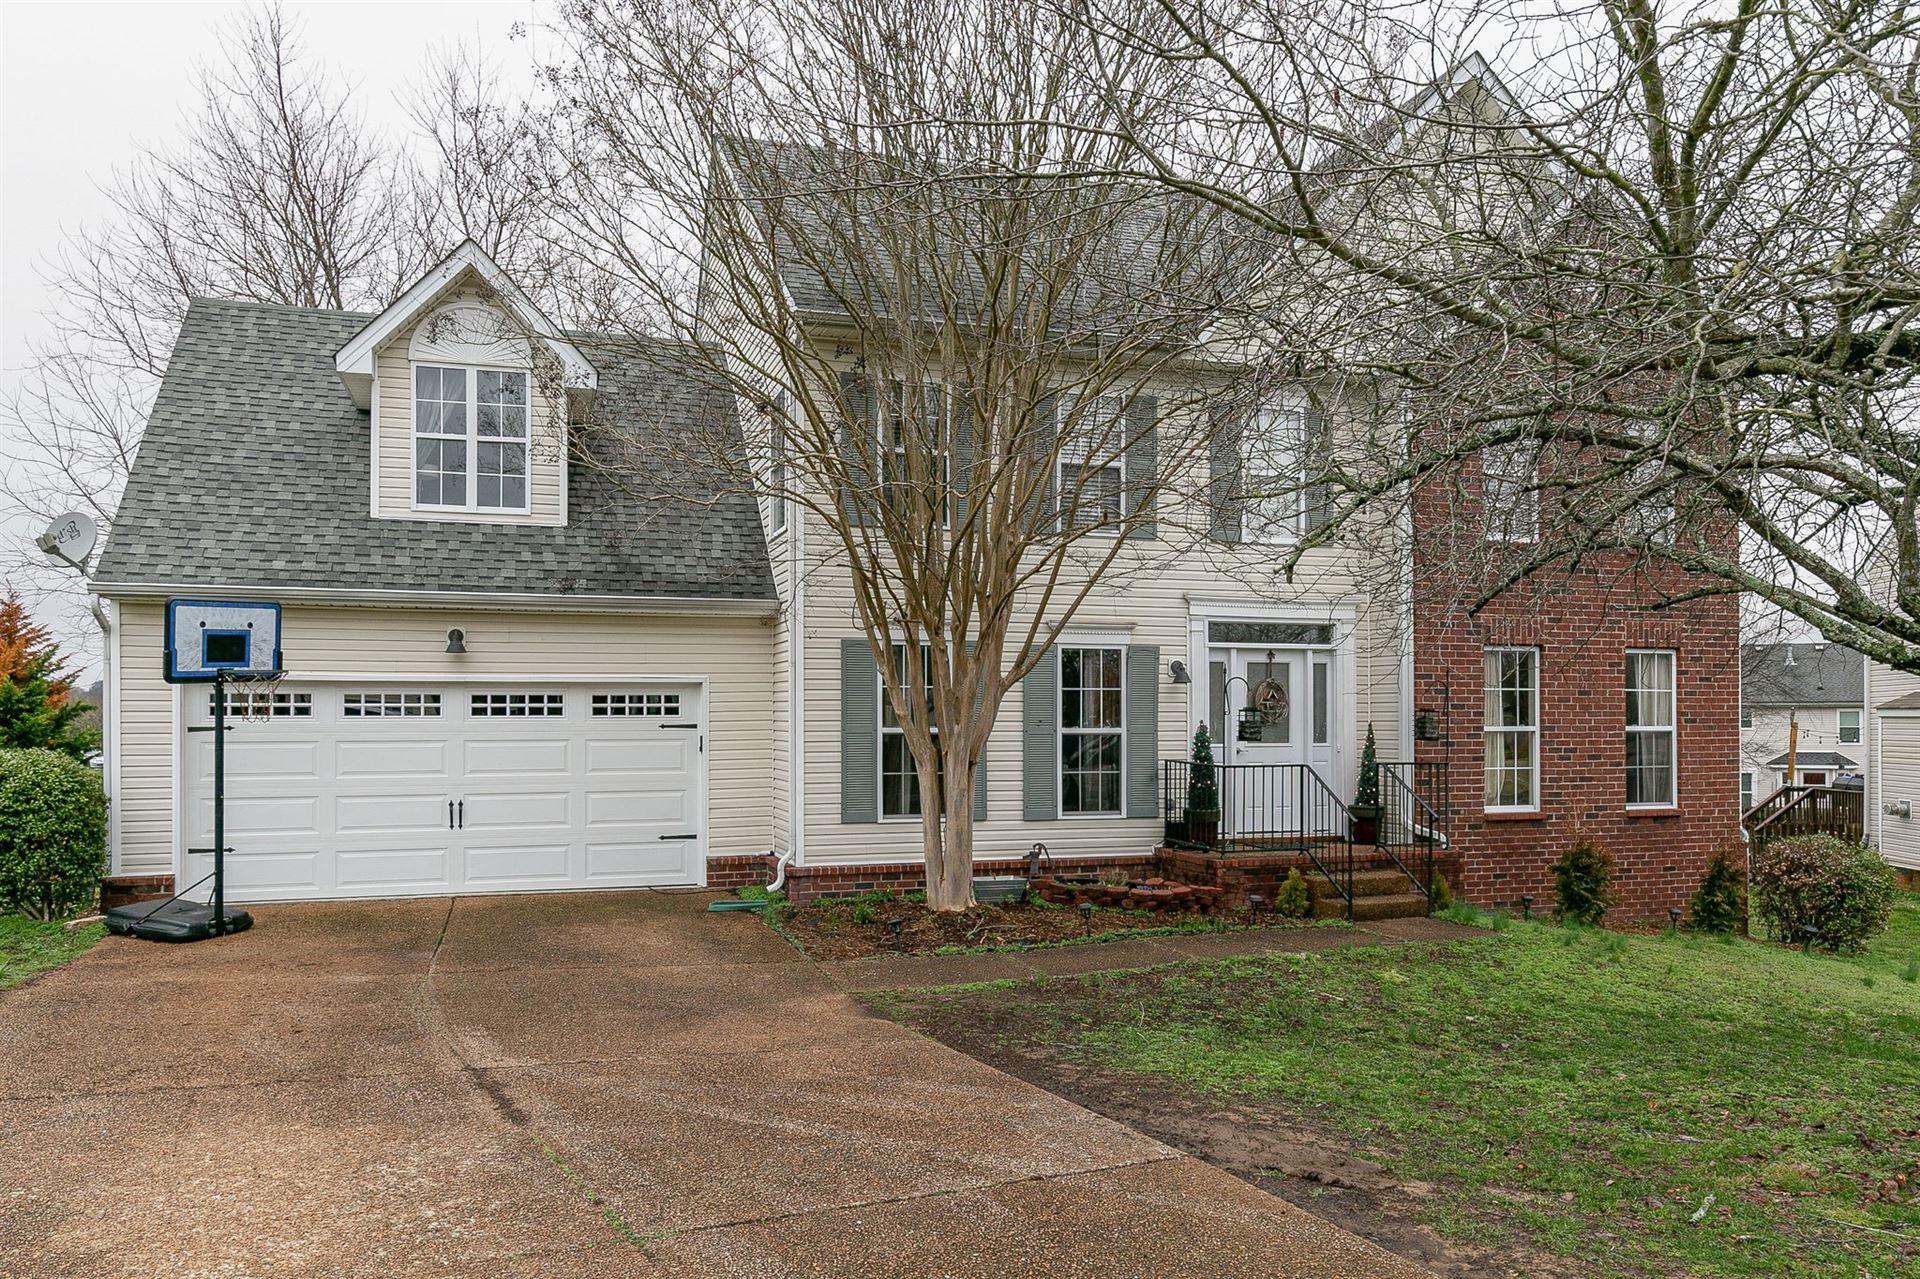 Photo of 2048 Prescott Way, Spring Hill, TN 37174 (MLS # 2121919)